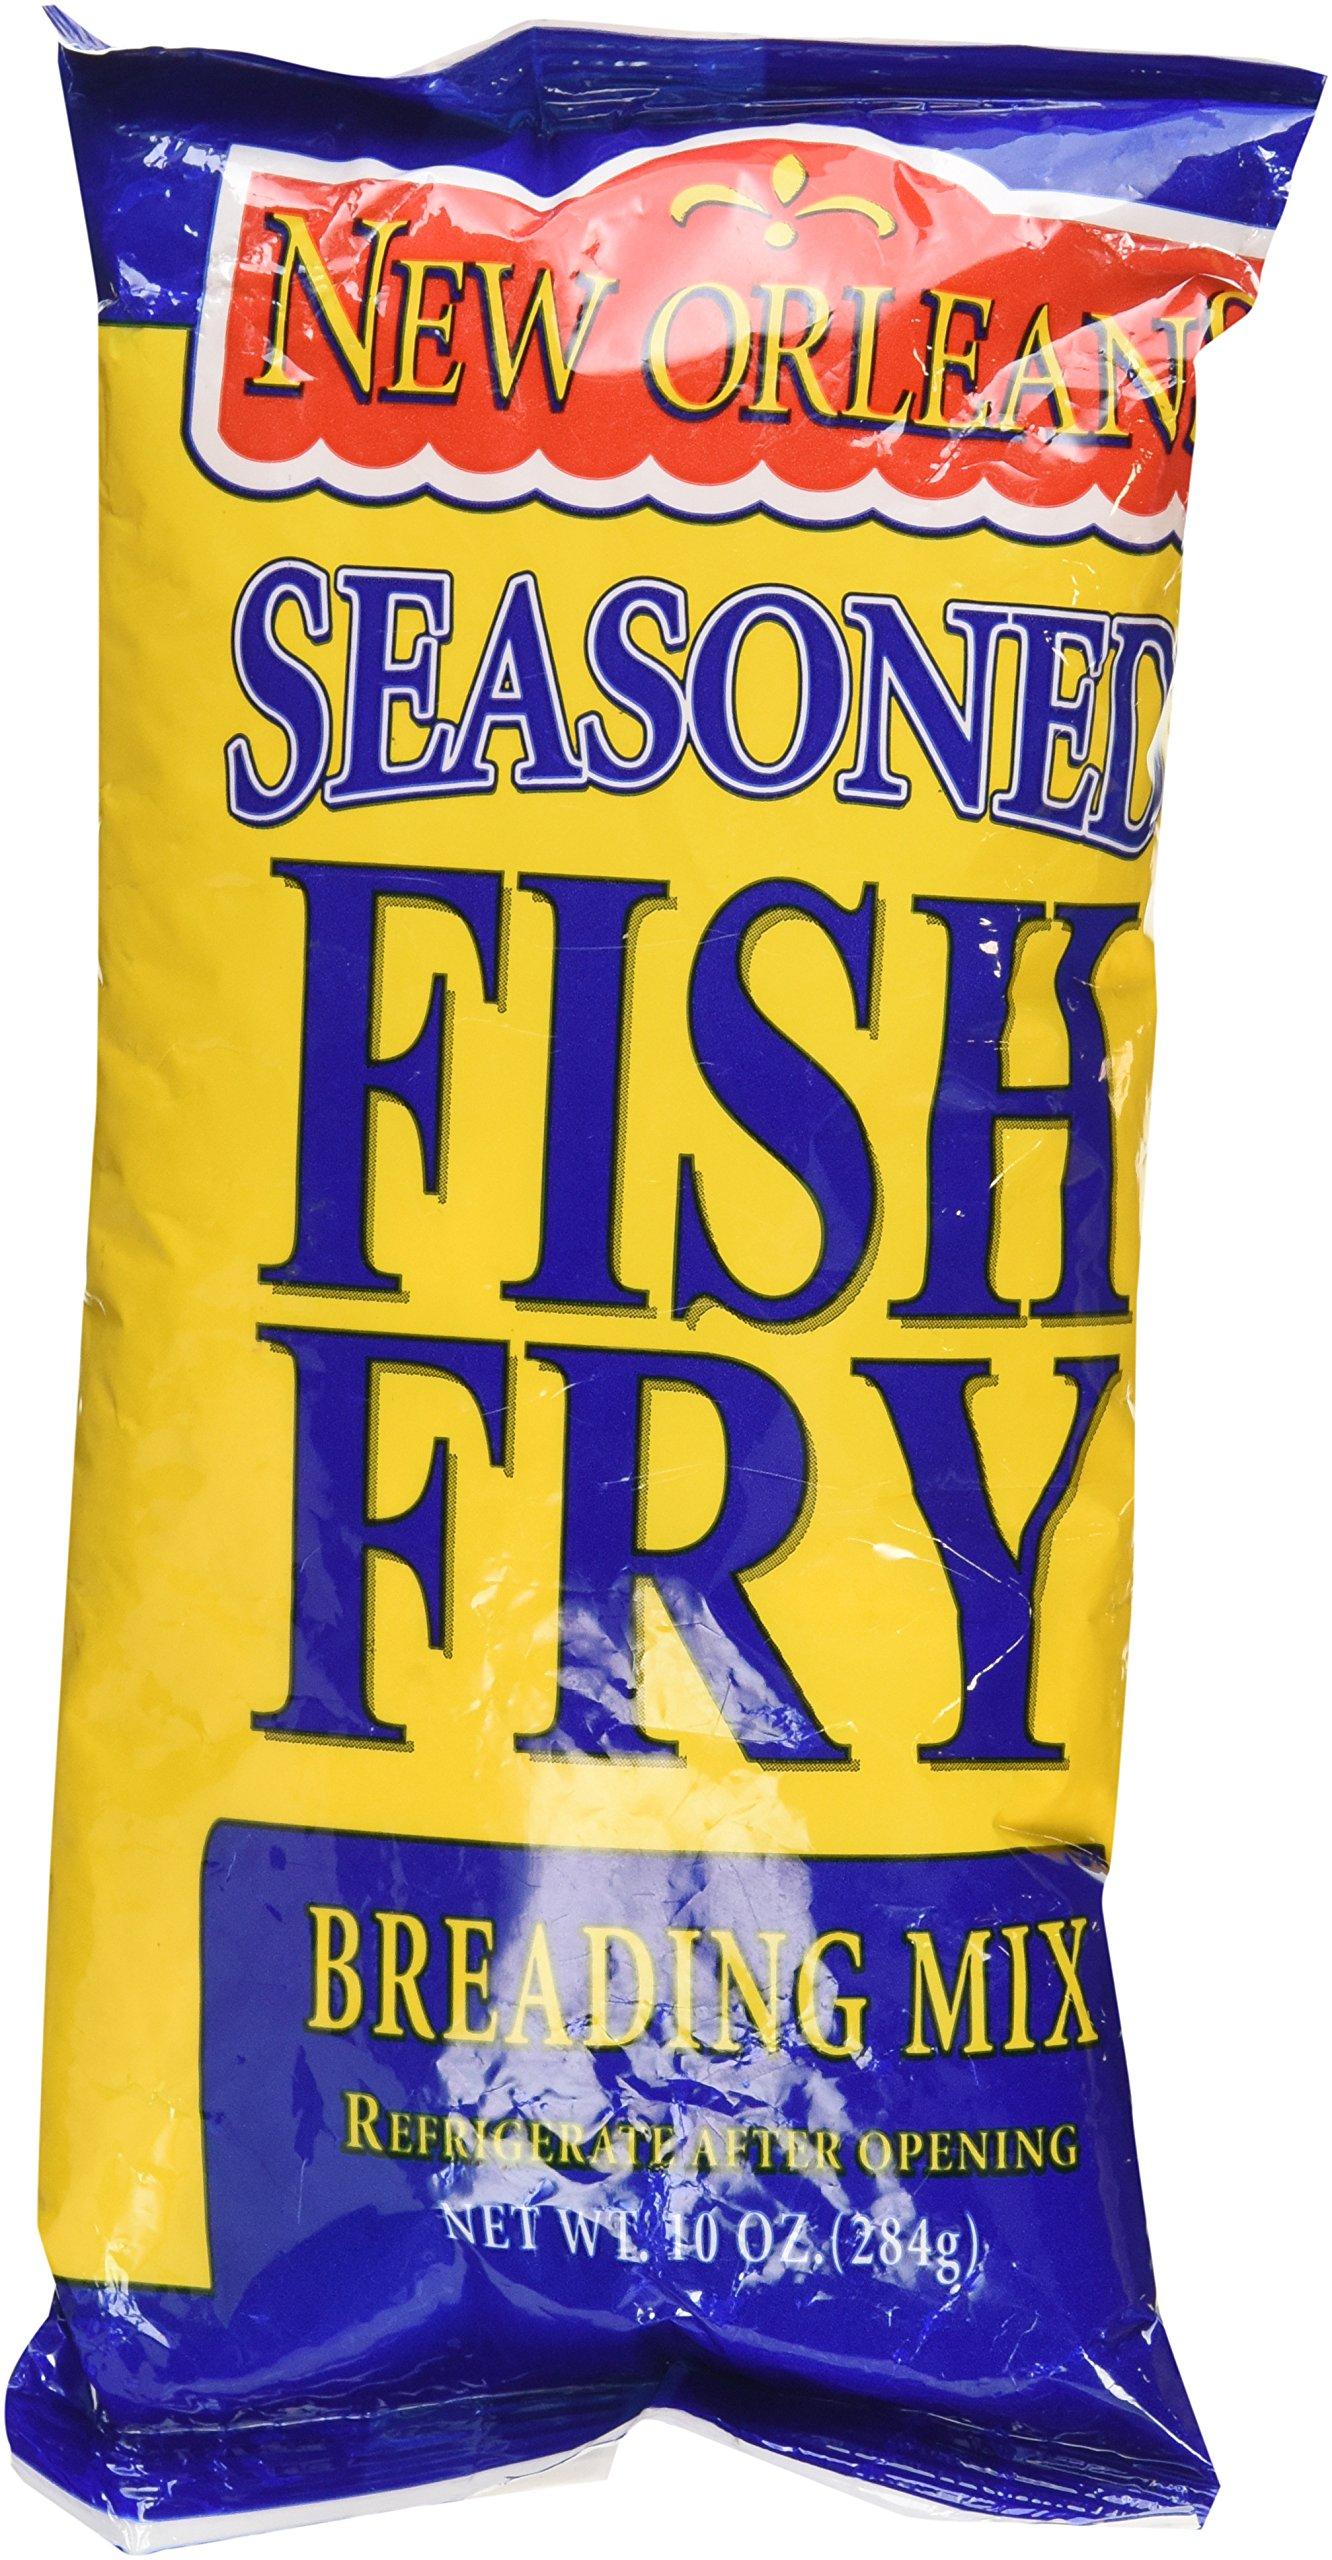 Zatarain's New Orleans Seasoned Fish Fry Breading Mix, 10 Ounces (Pack of 2)